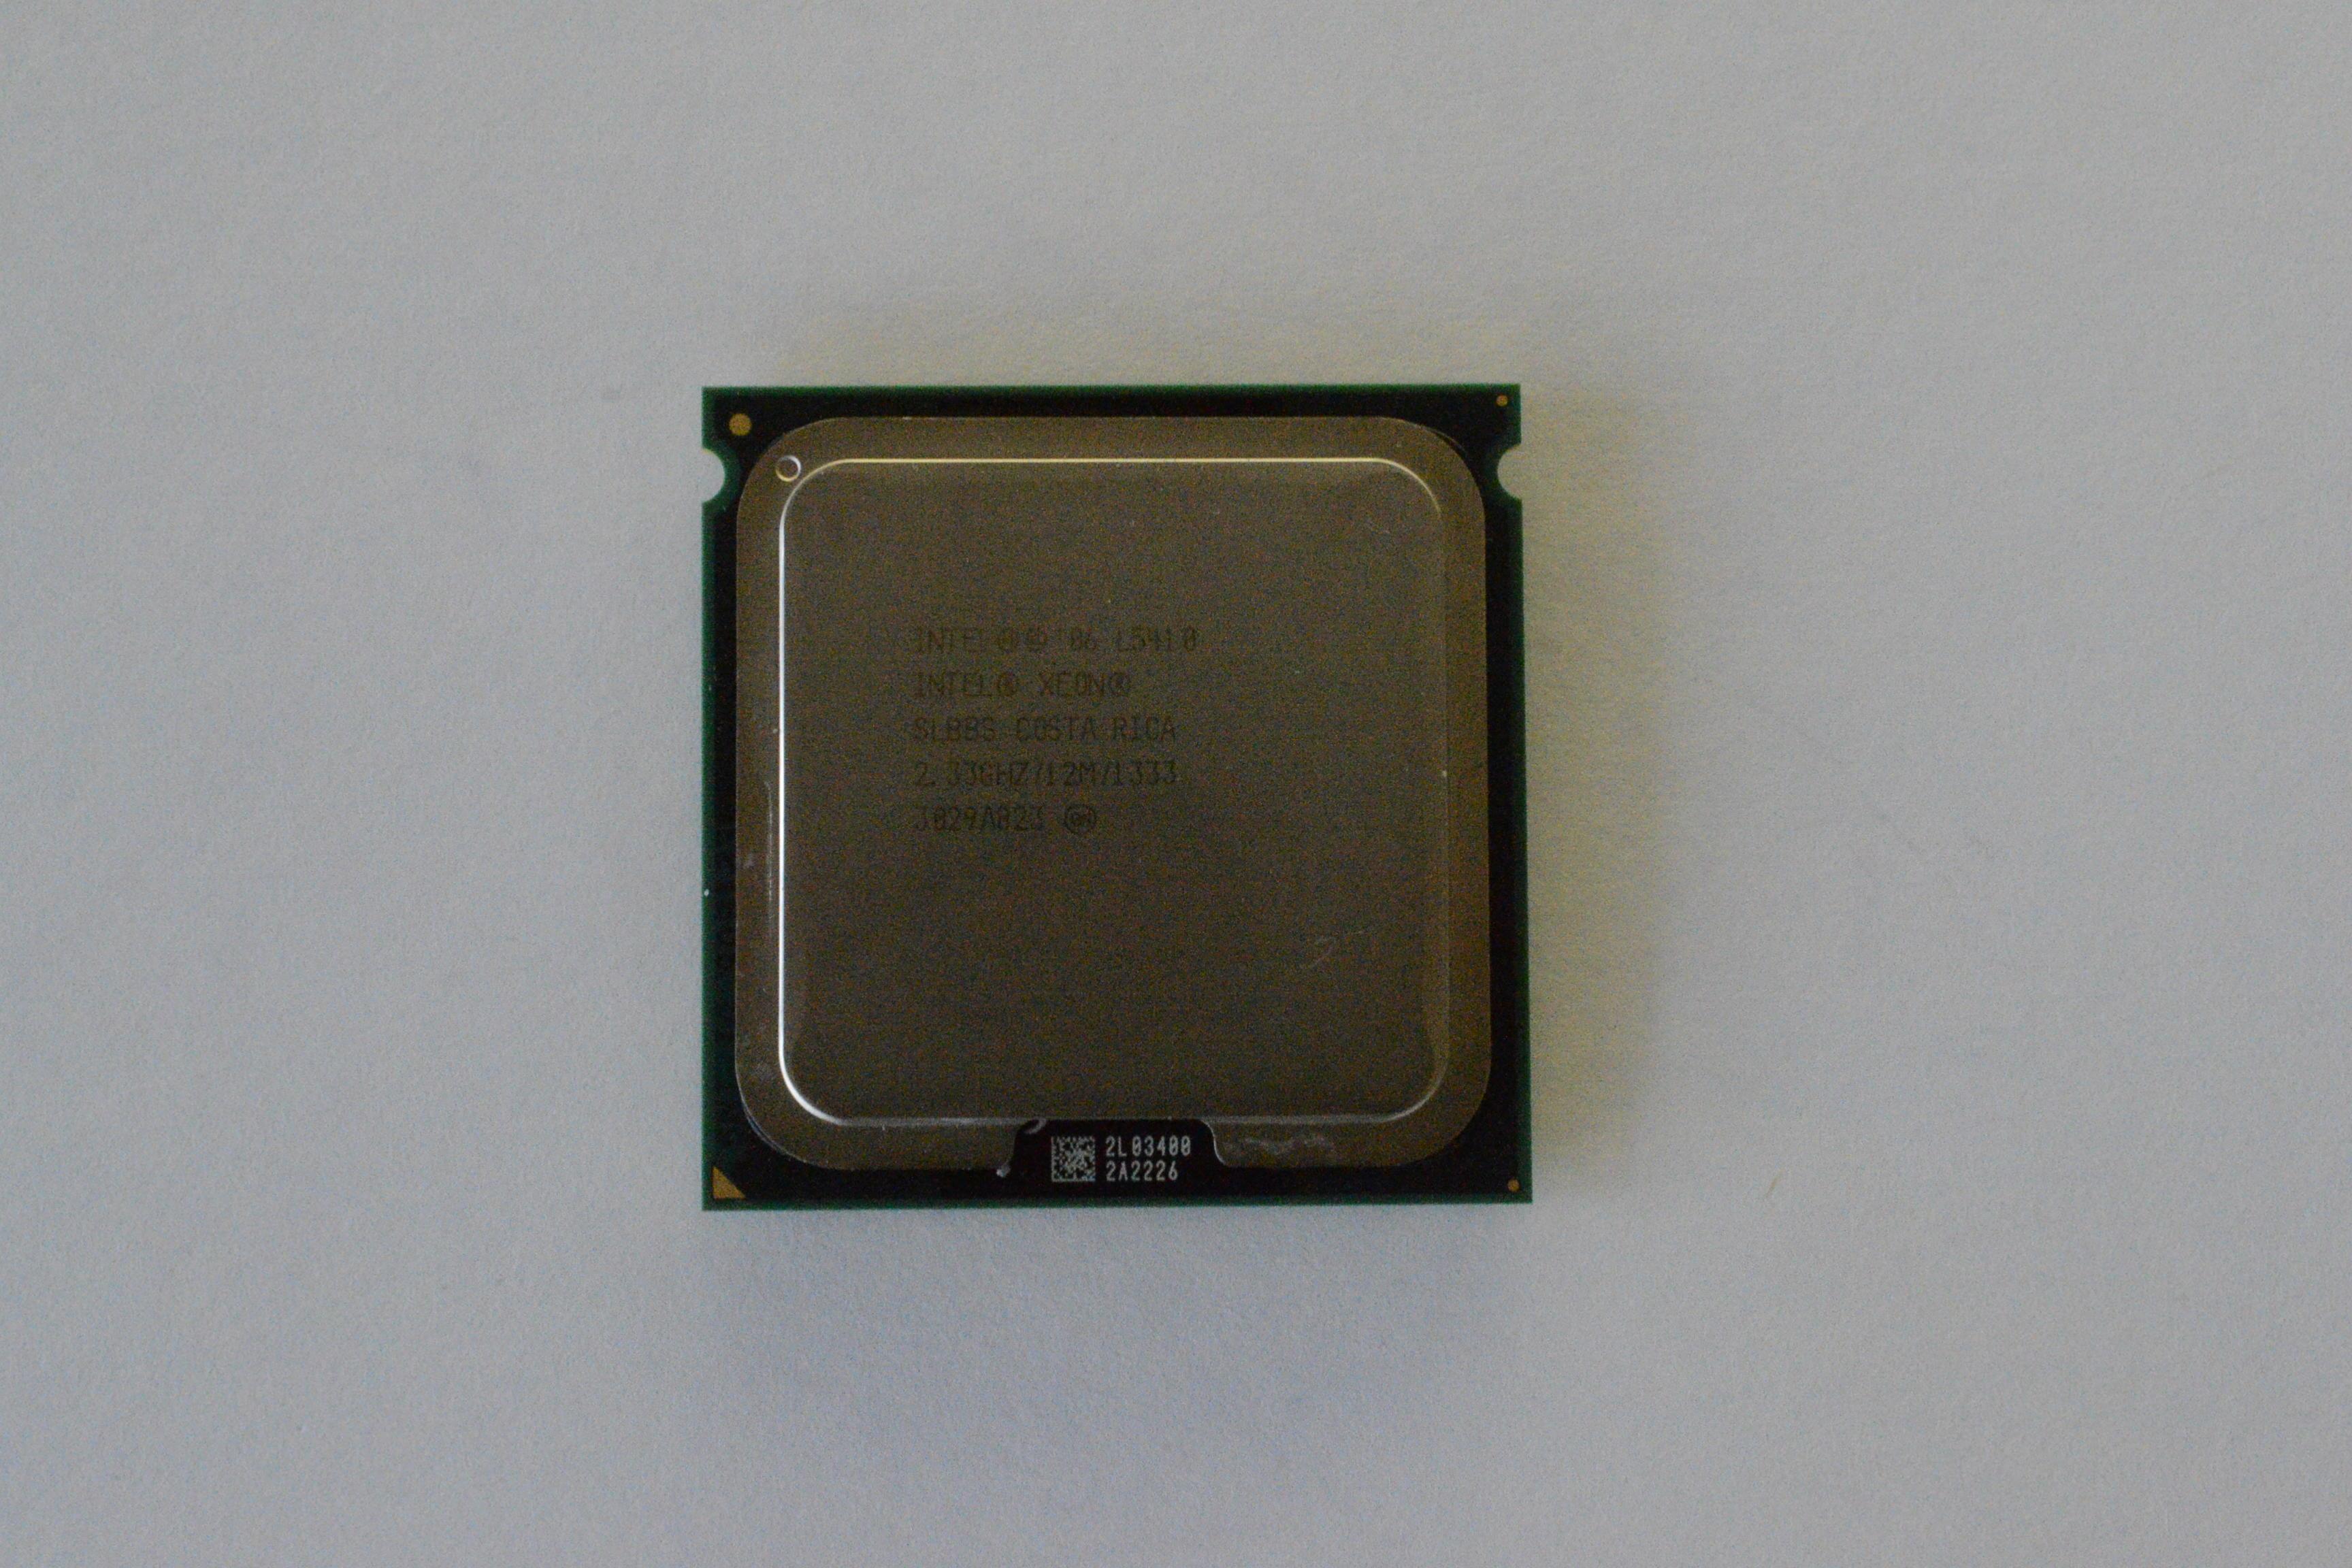 INTEL L5410 IBM XIV CPU